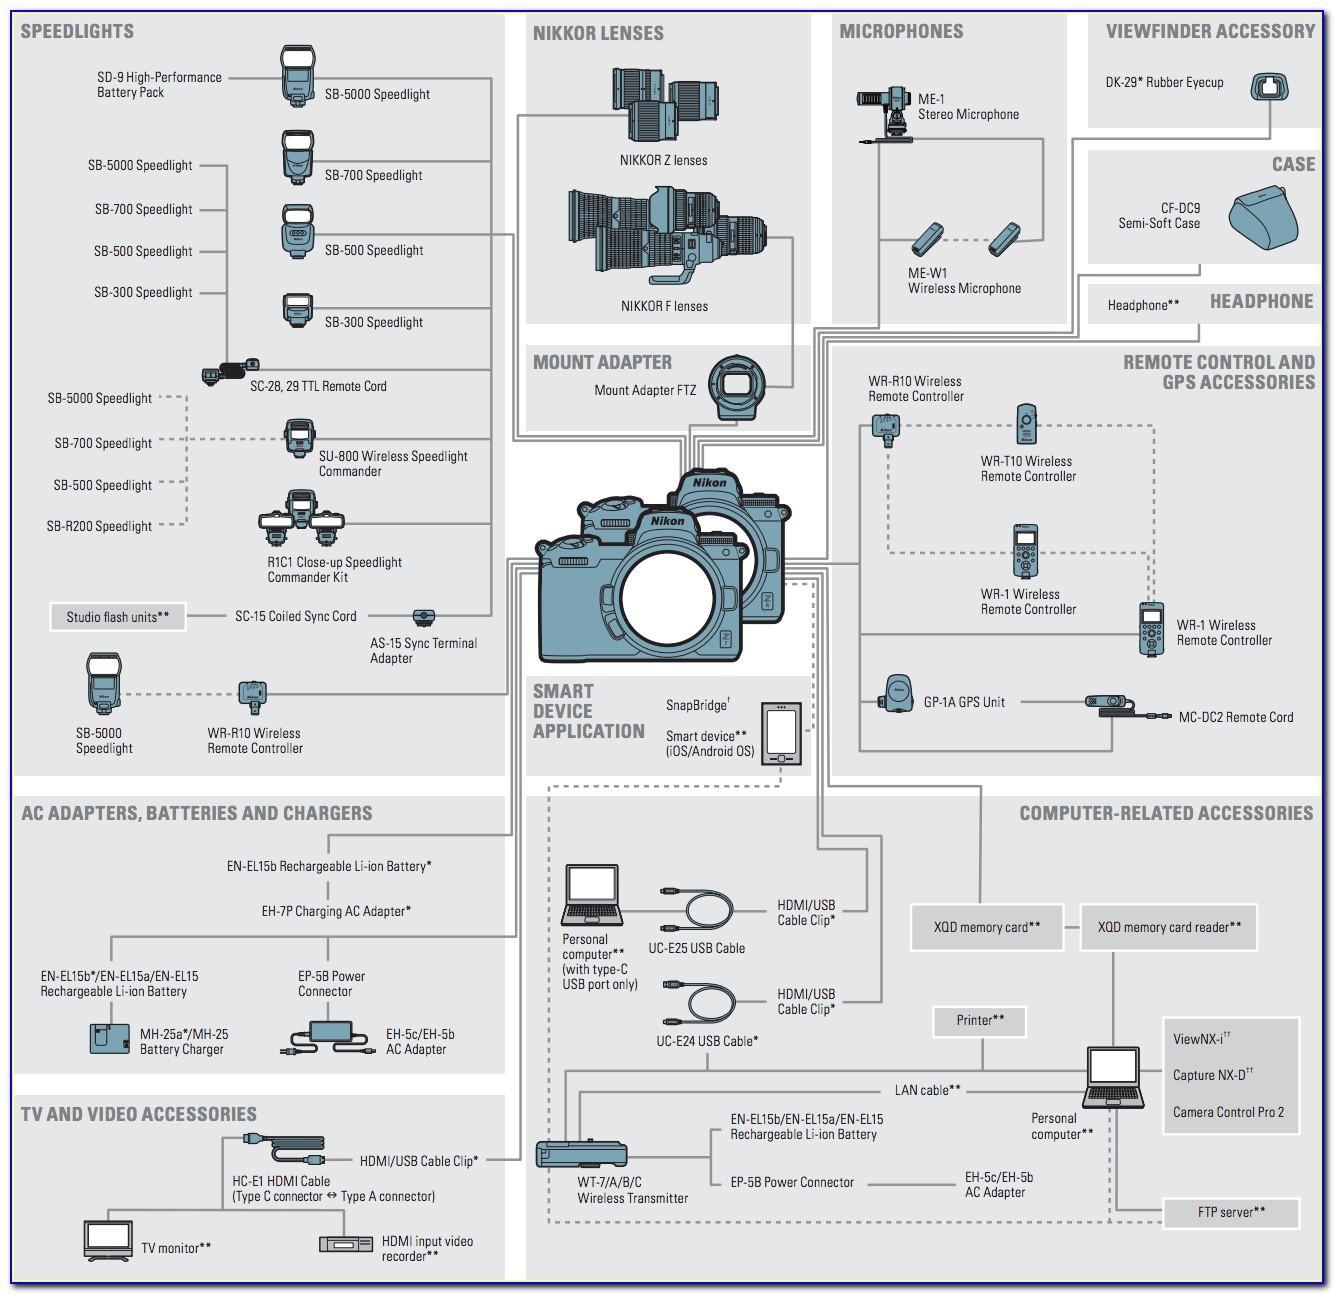 Nikon Z7 Brochure Pdf